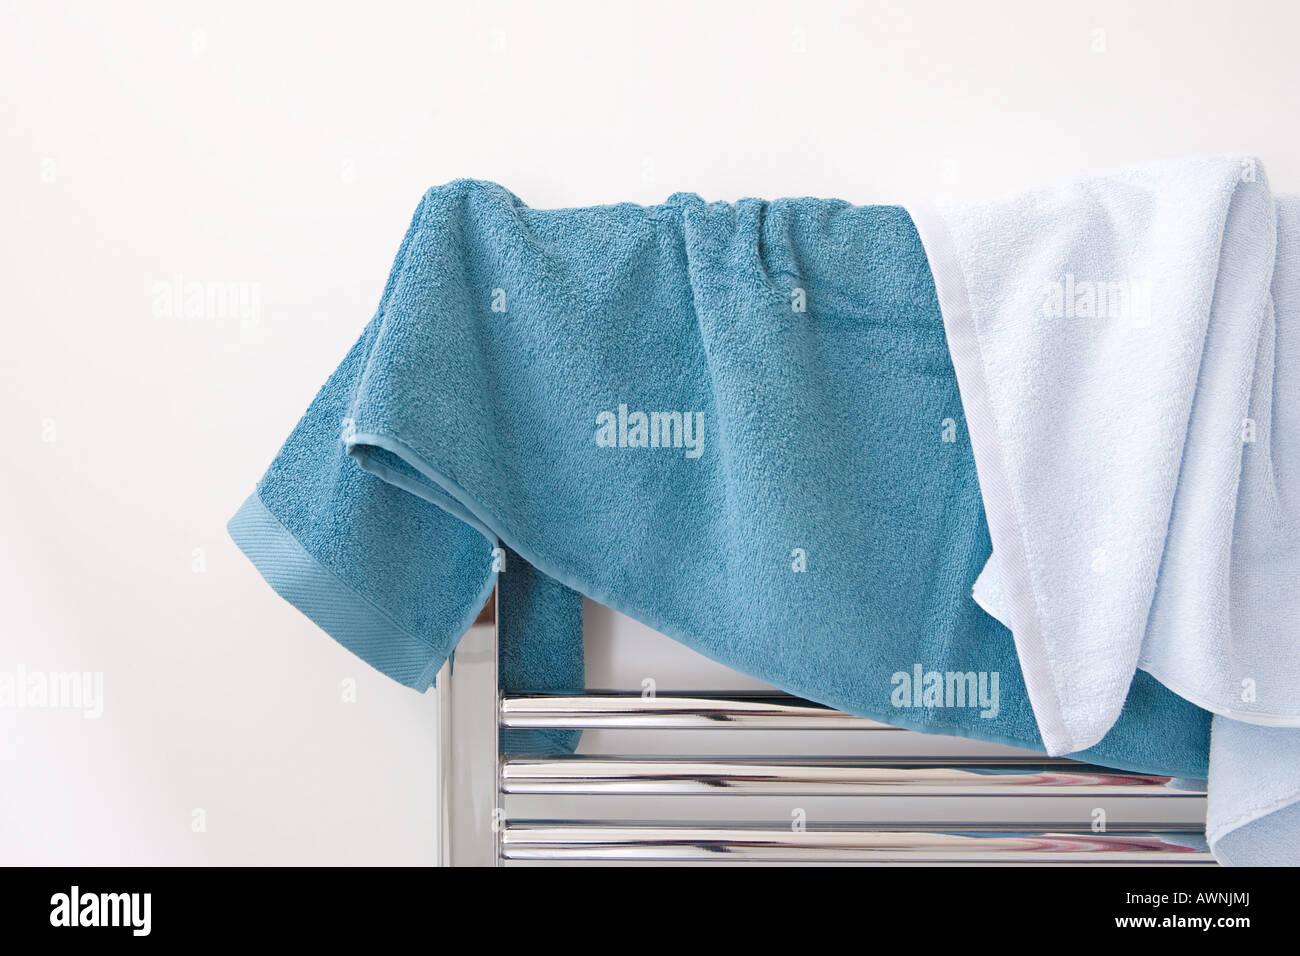 Handtücher Auf Dem Heizkörper Trocknen Stockfoto, Bild